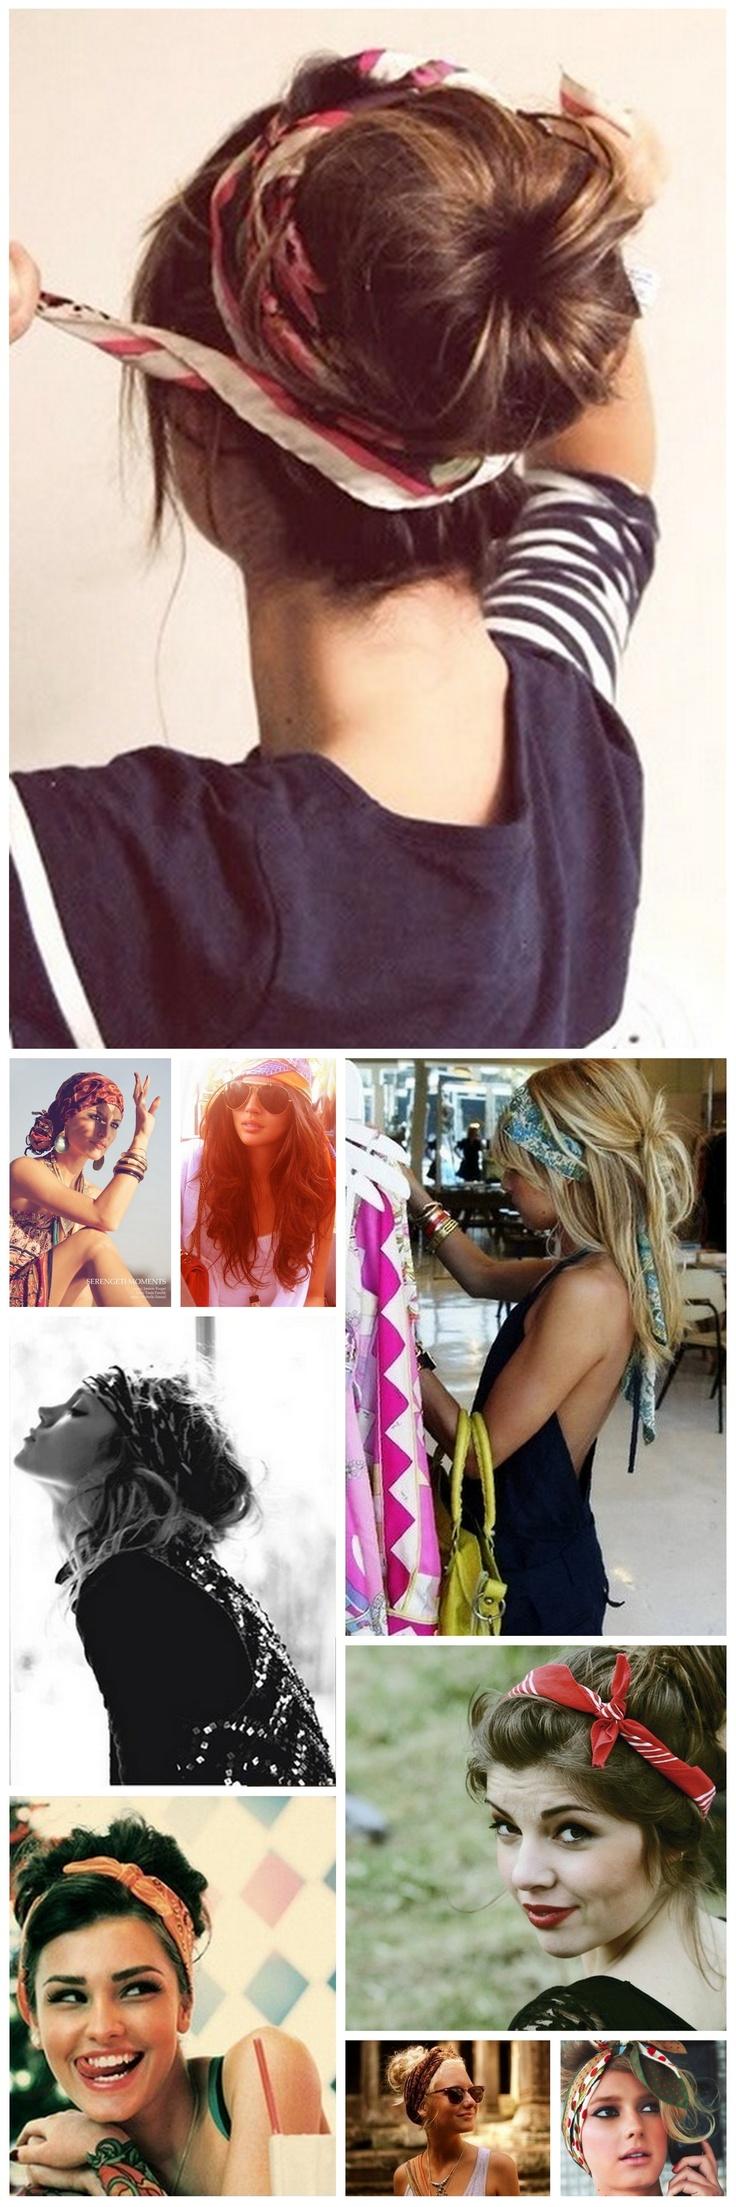 Quelle Coiffure Choisir dedans coiffure foulard cheveux longs